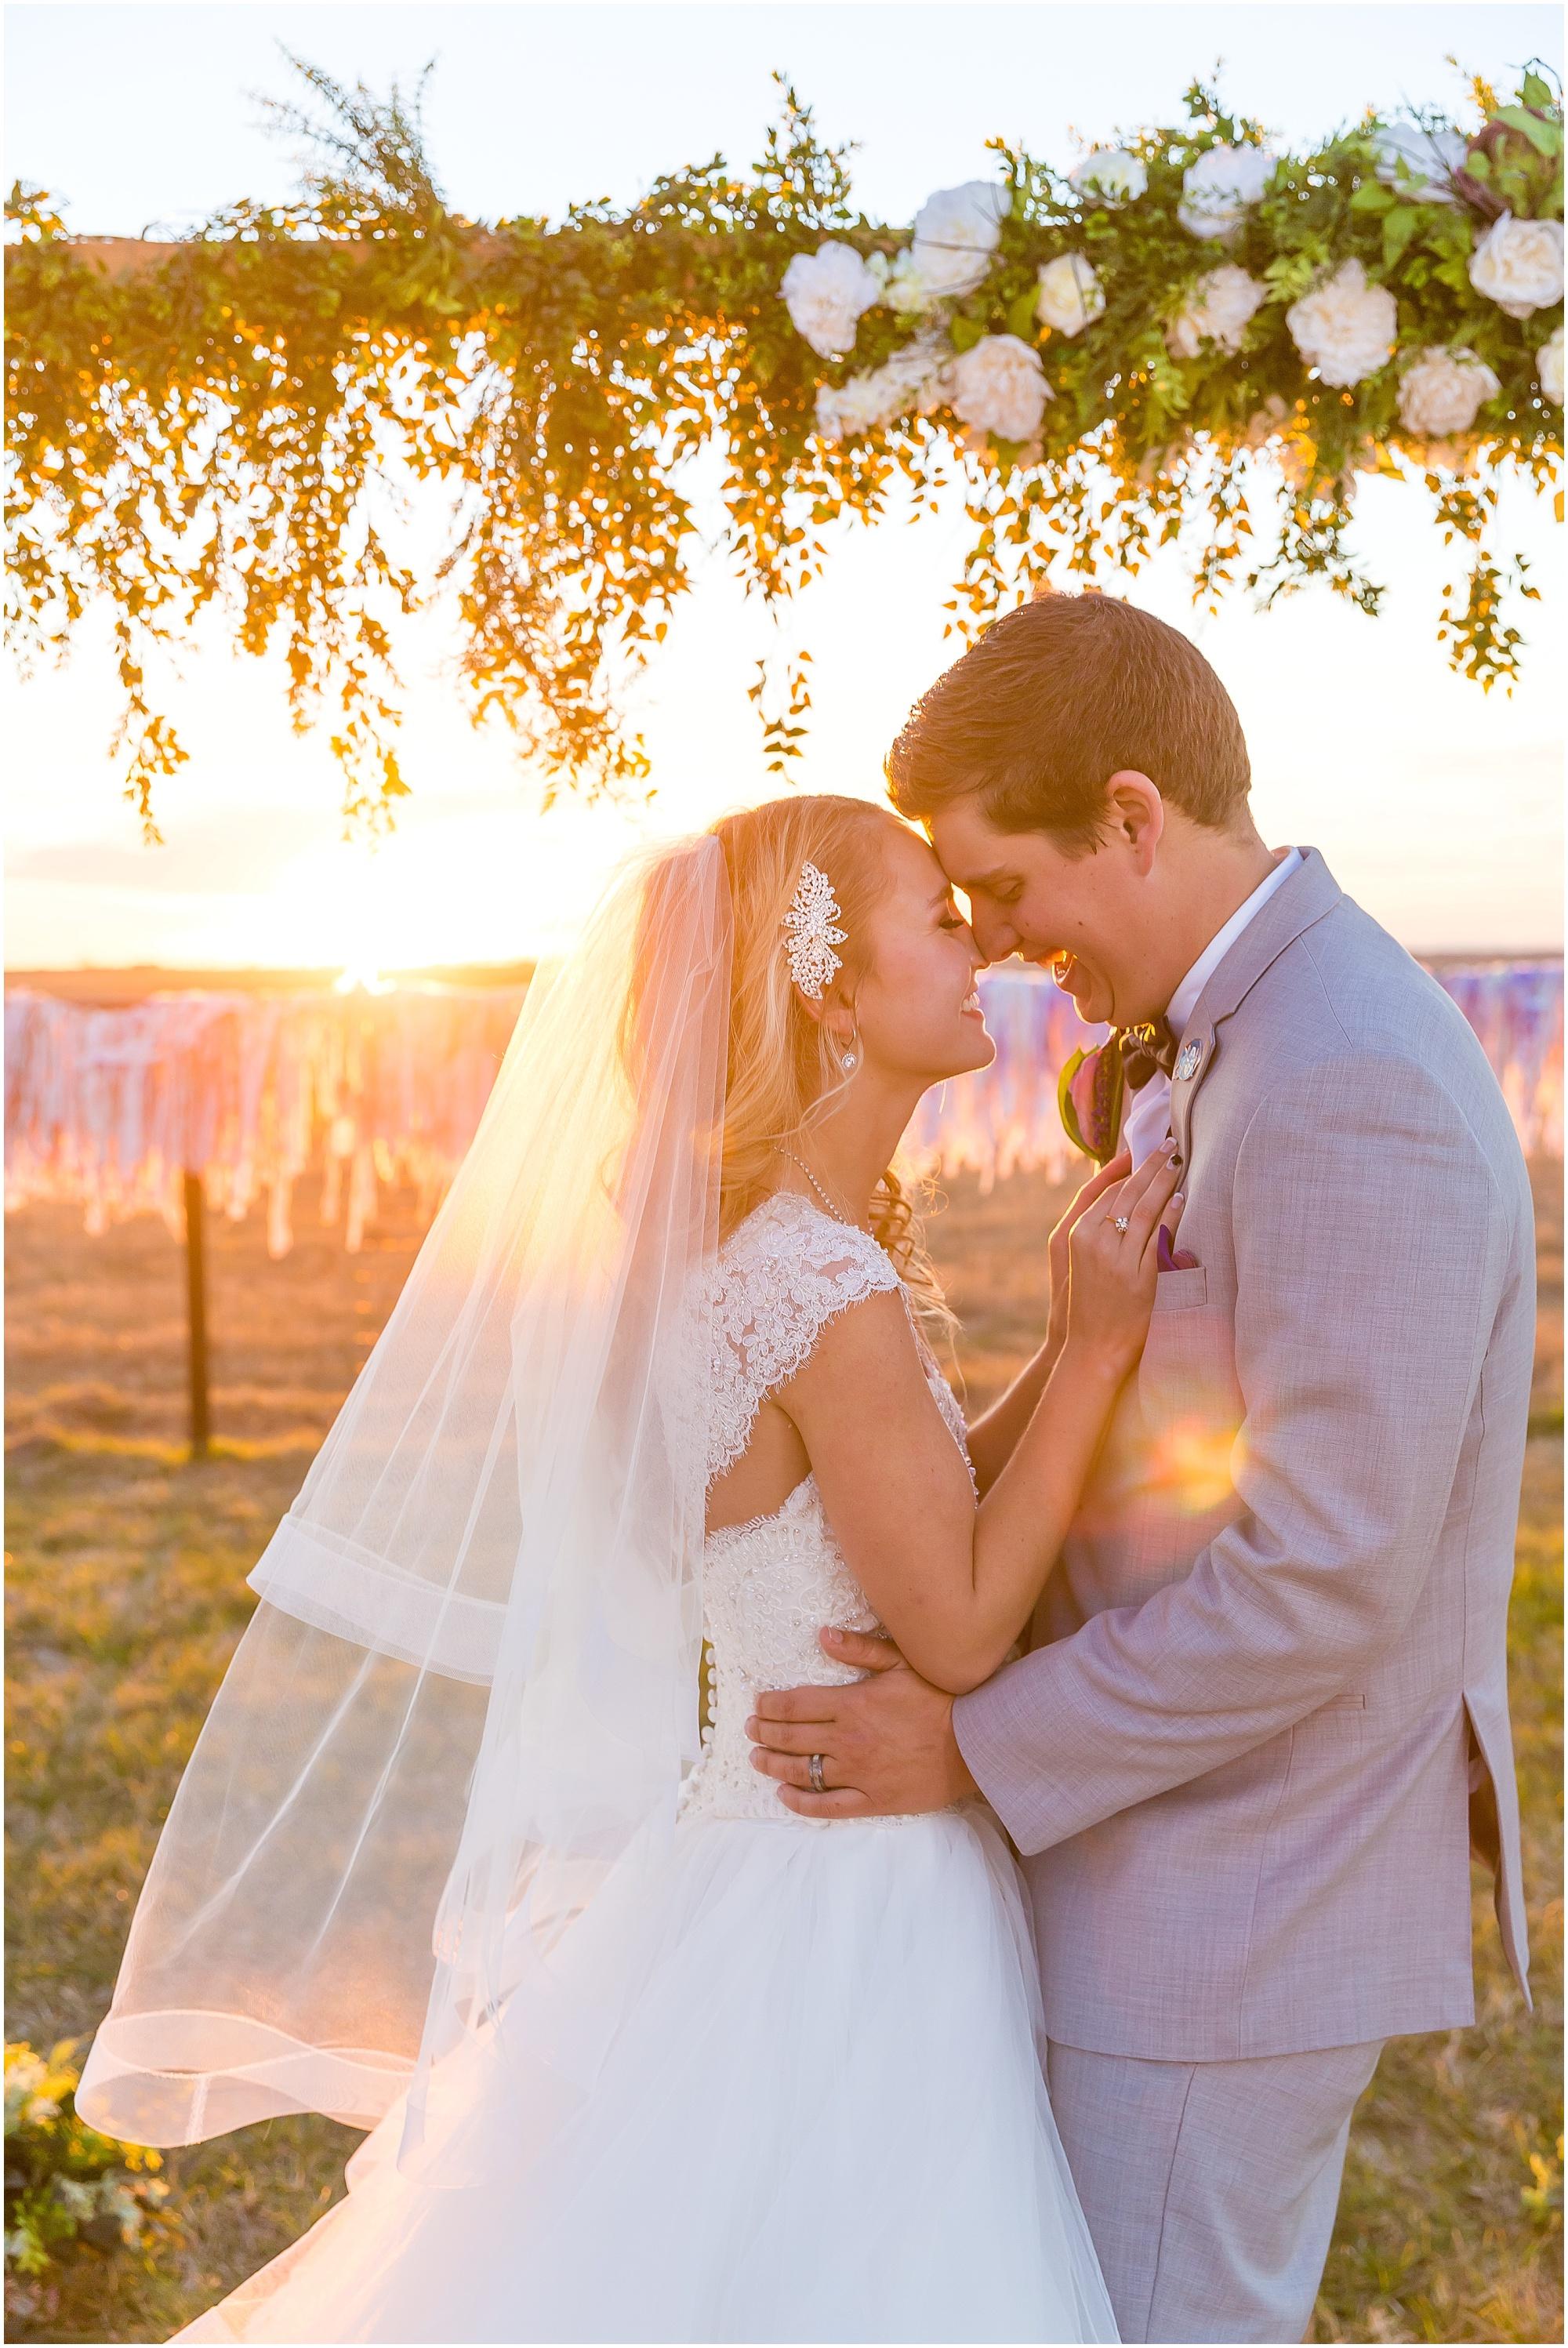 Bride and groom laugh together in the sunset light of golden hour - Jason & Melaina Photography - www.jasonandmelaina.com